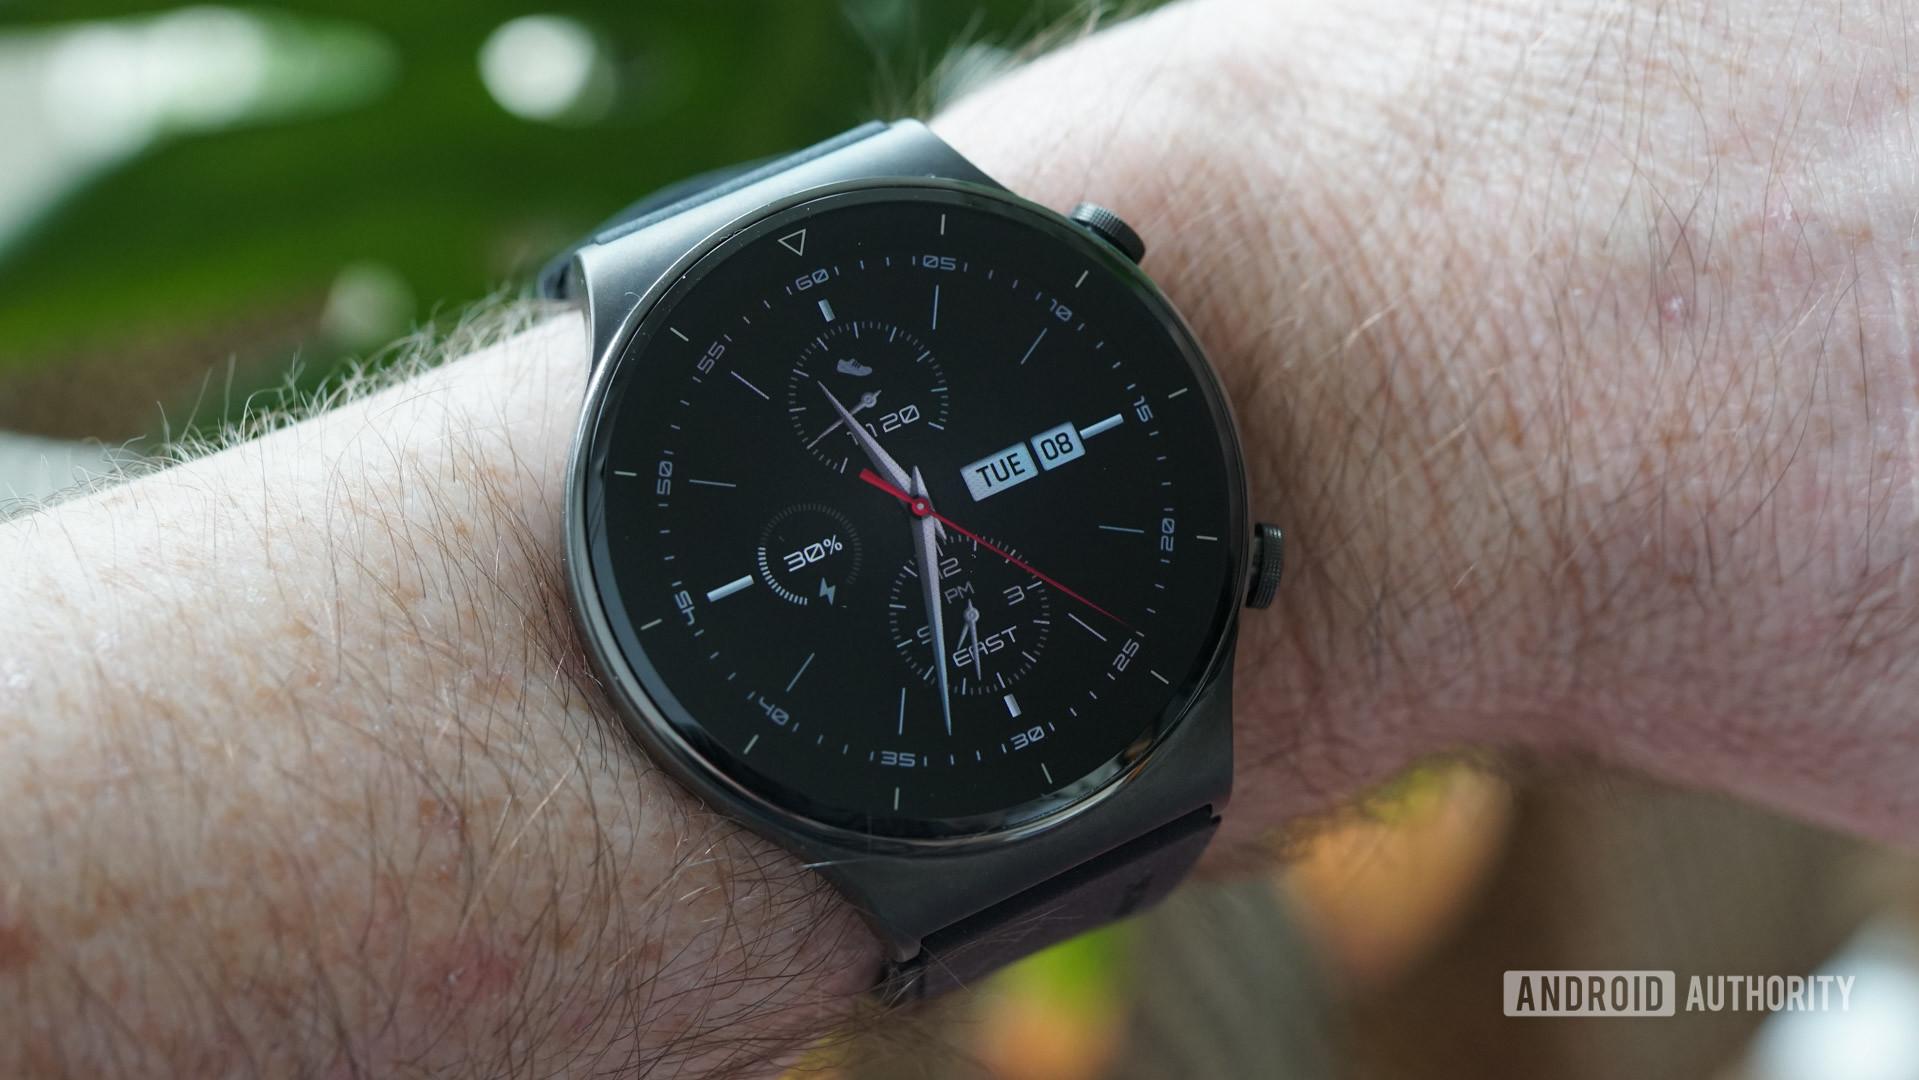 Huawei Watch GT 2 Pro smartwatch face 3